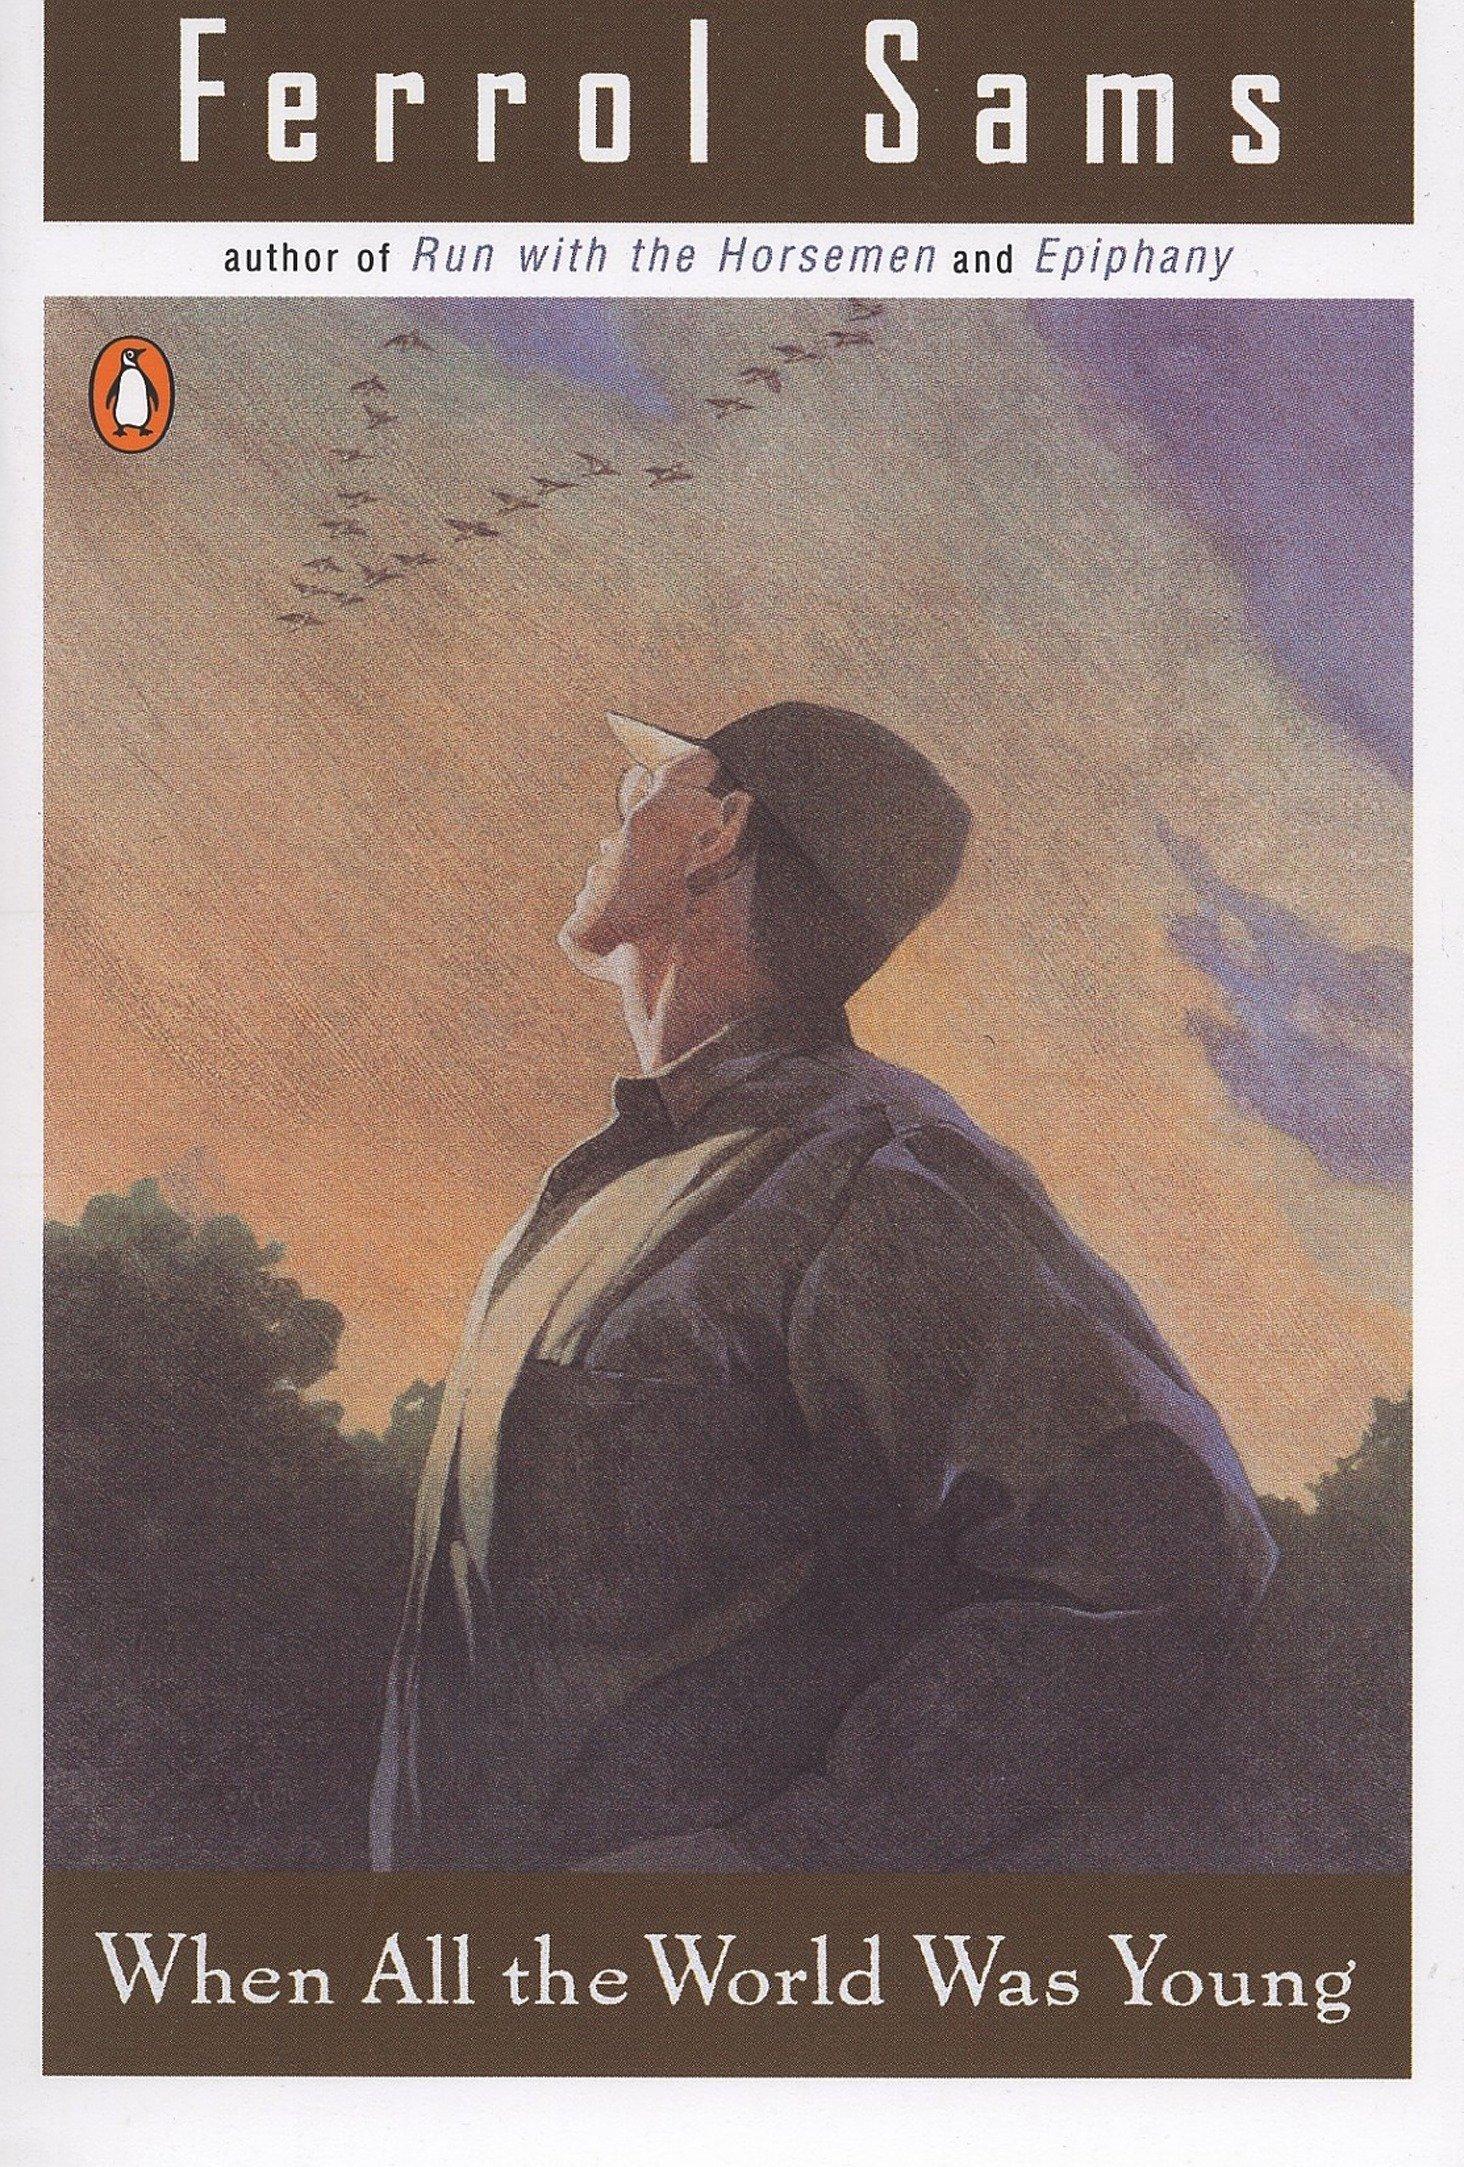 When All the World Was Young (Contemporary American Fiction): Ferrol Sams:  9780140172270: Amazon.com: Books